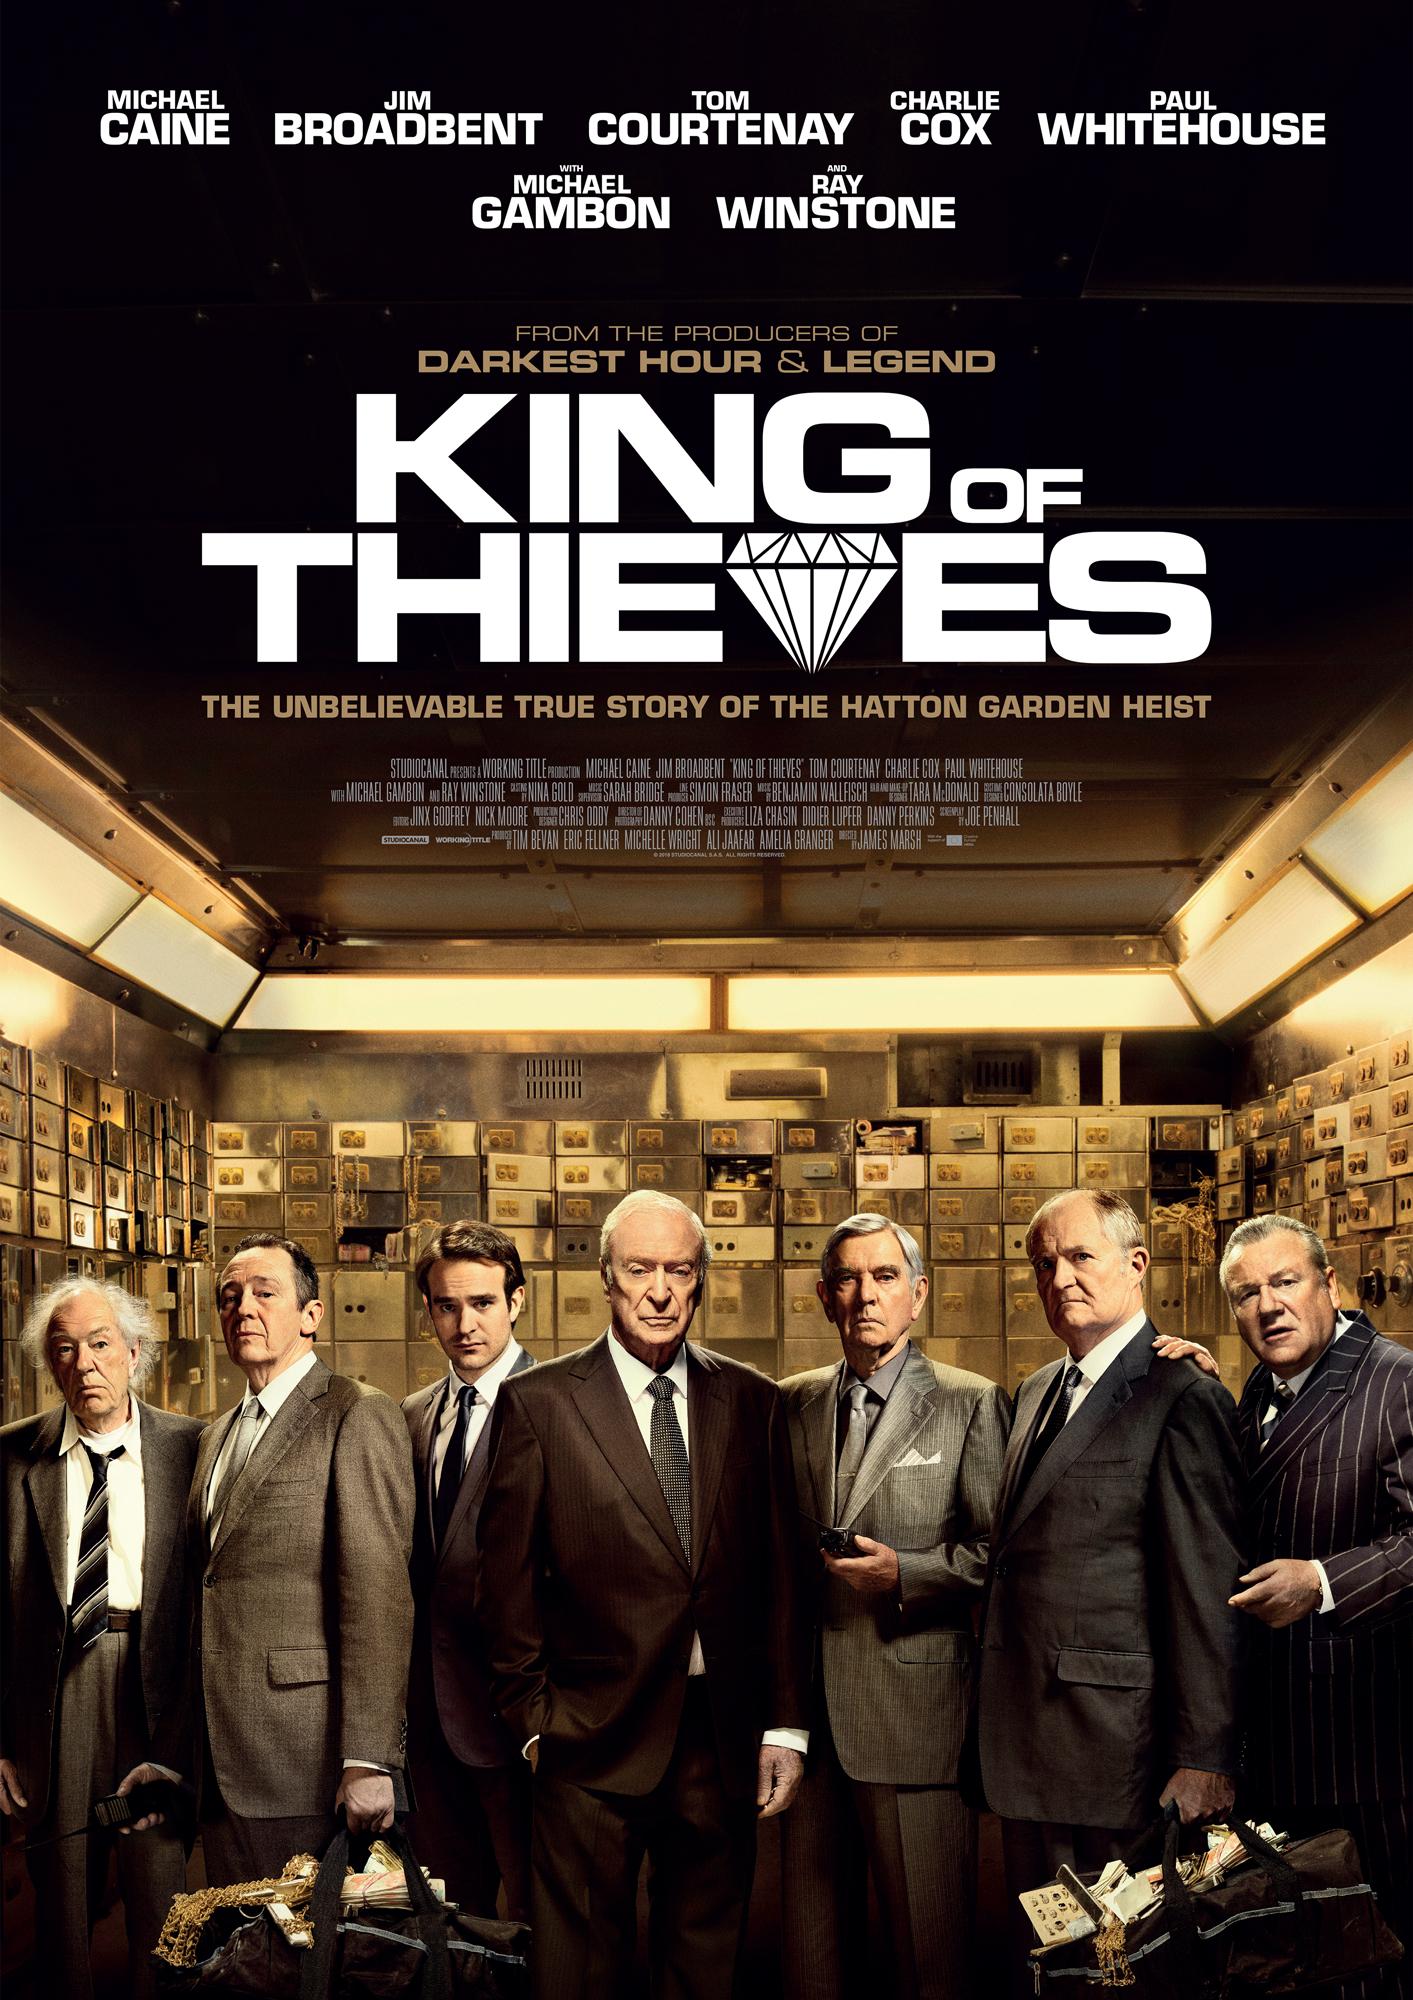 King of Thieves (2018) BluRay 720p & 1080p